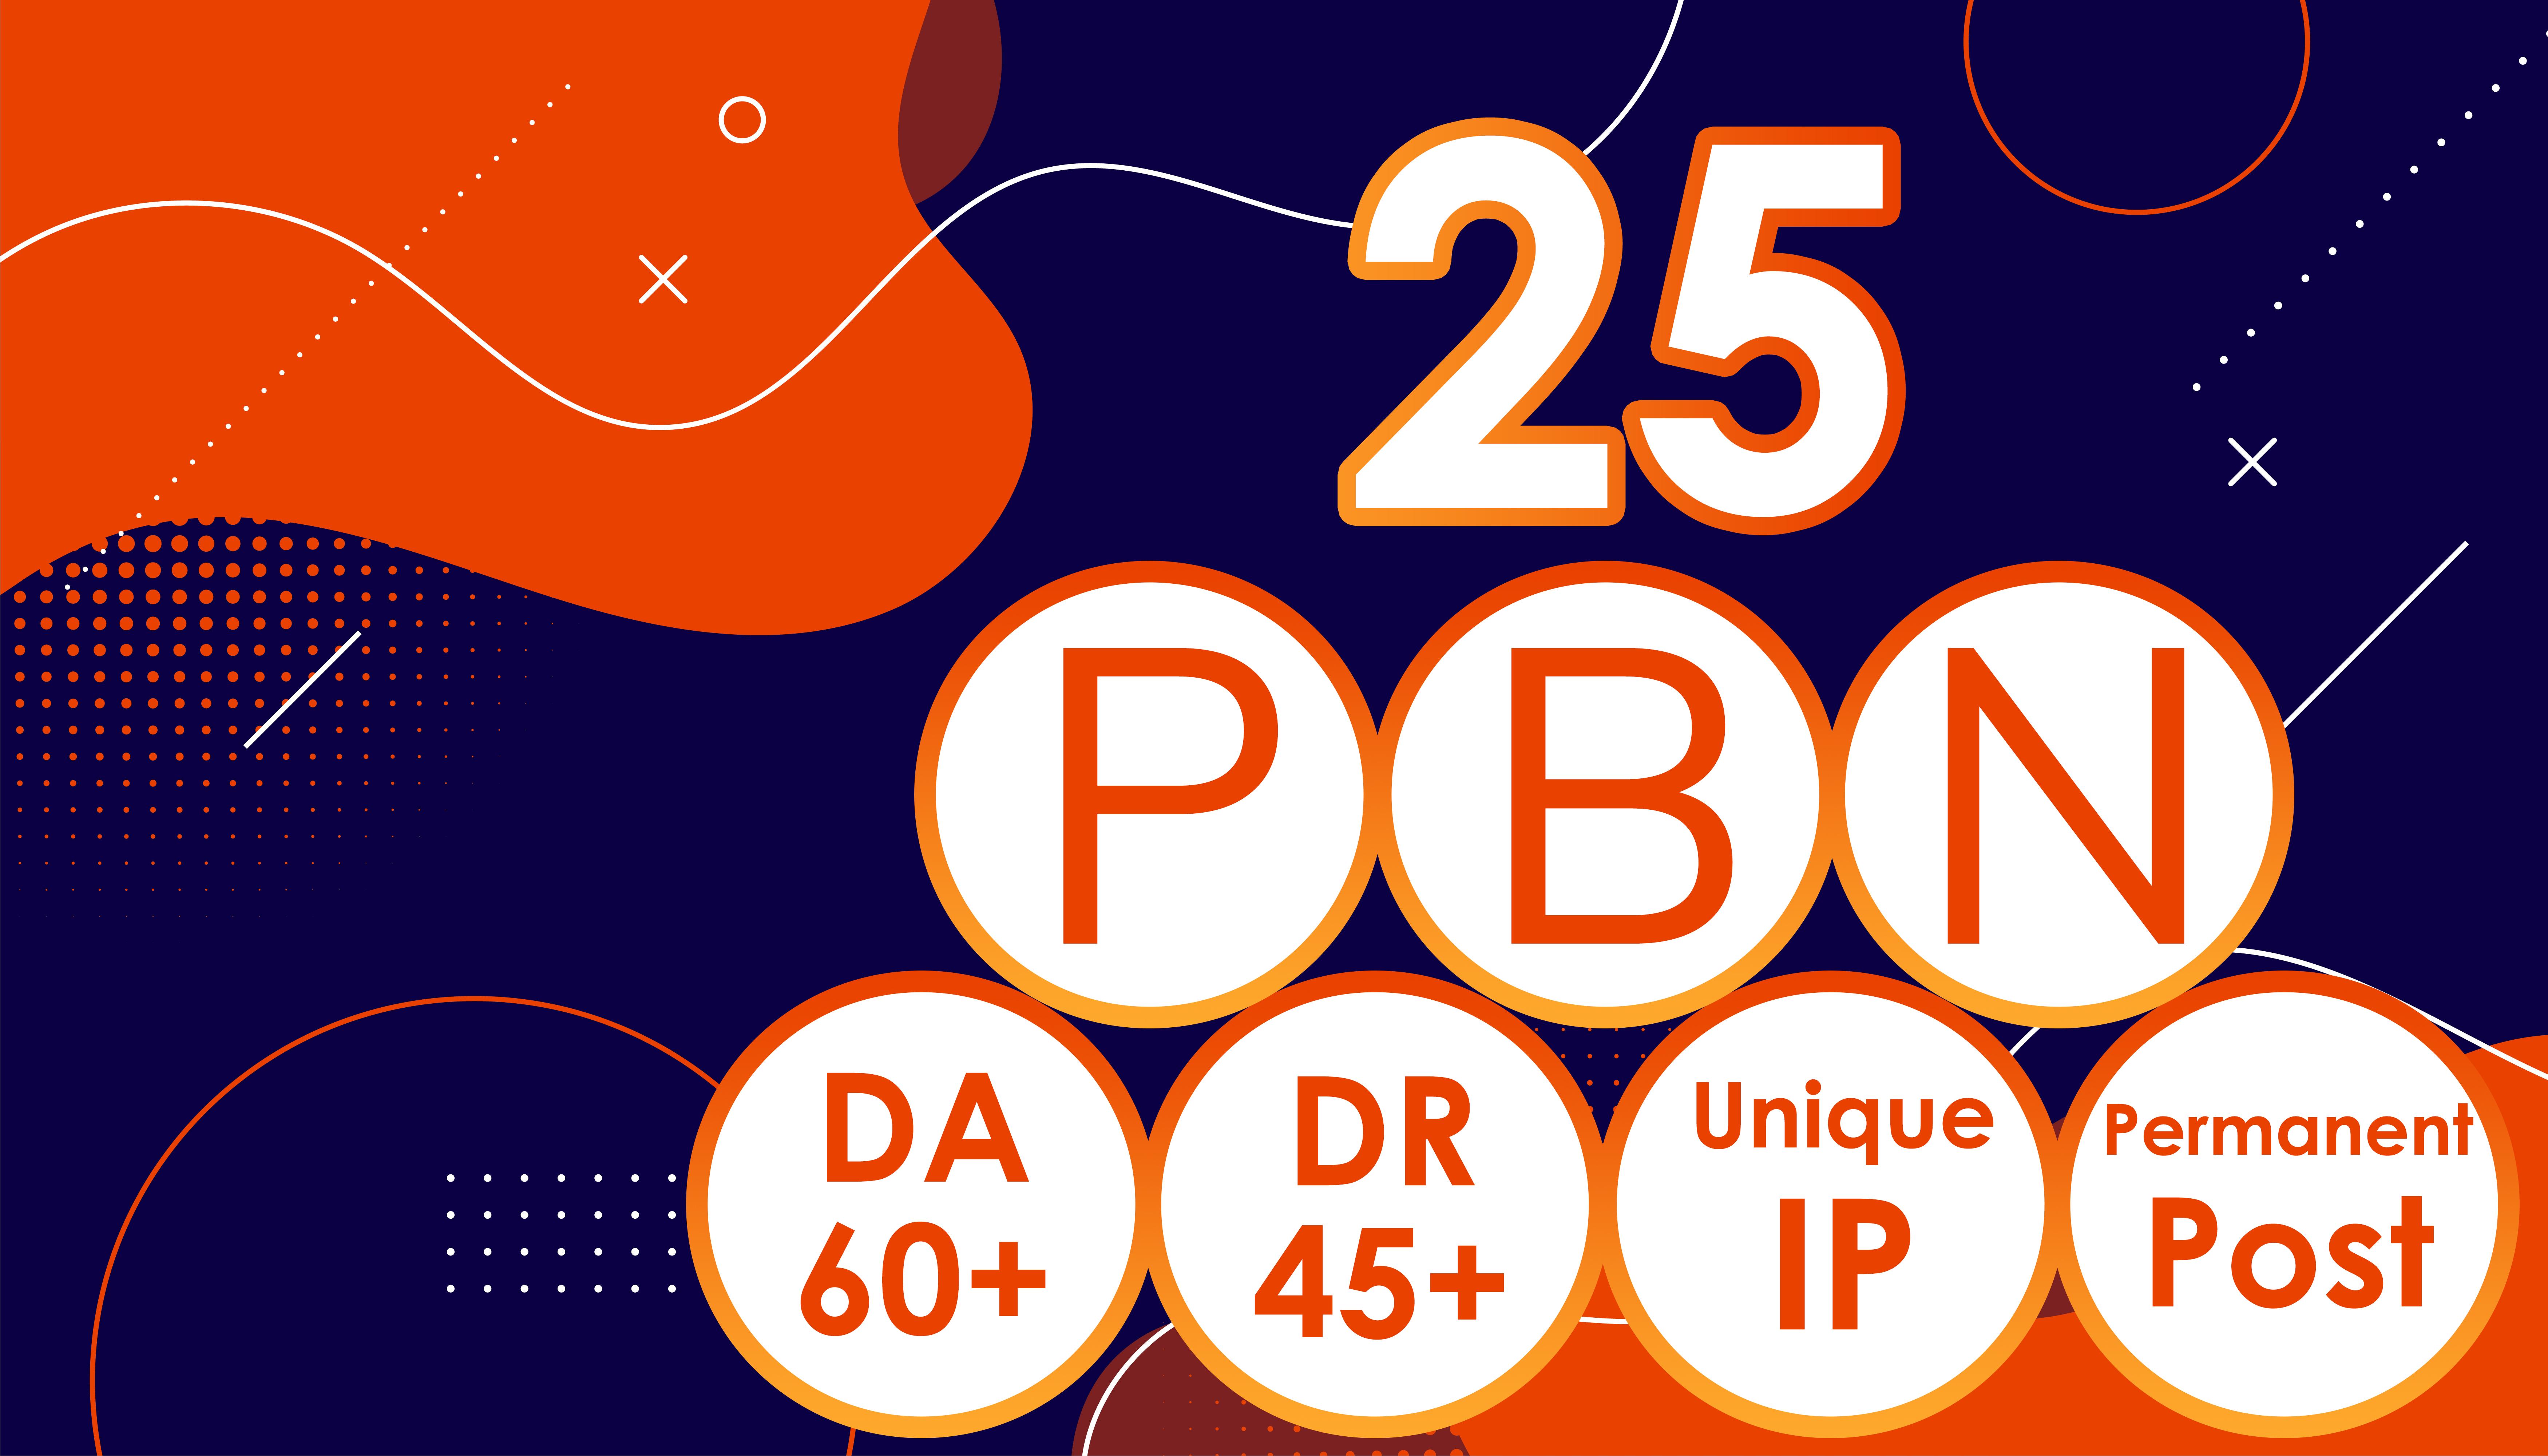 Get 25 High Authority PBNs DA-60+ DR-45+ Permanent Post Dofollow Contextual Backlink